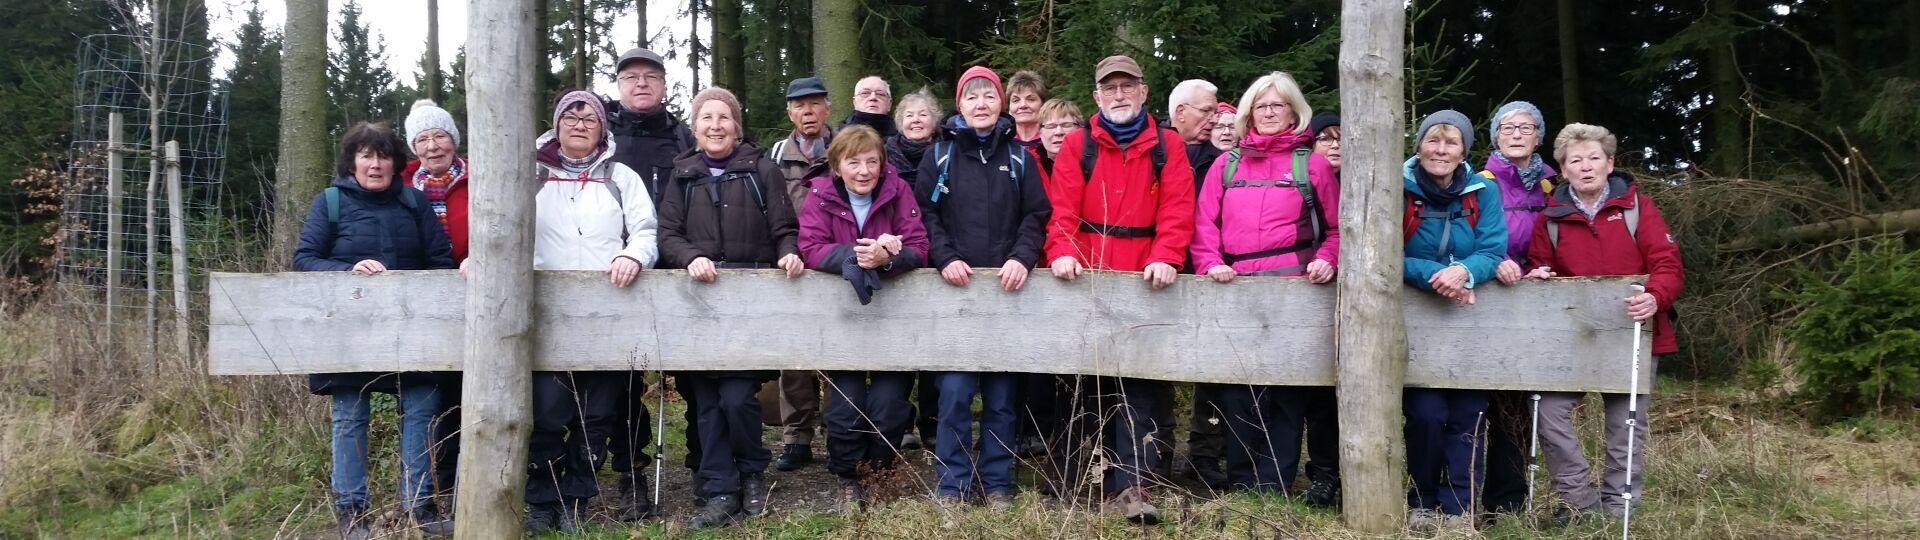 Samstagswandergruppe am Deister Nordblick